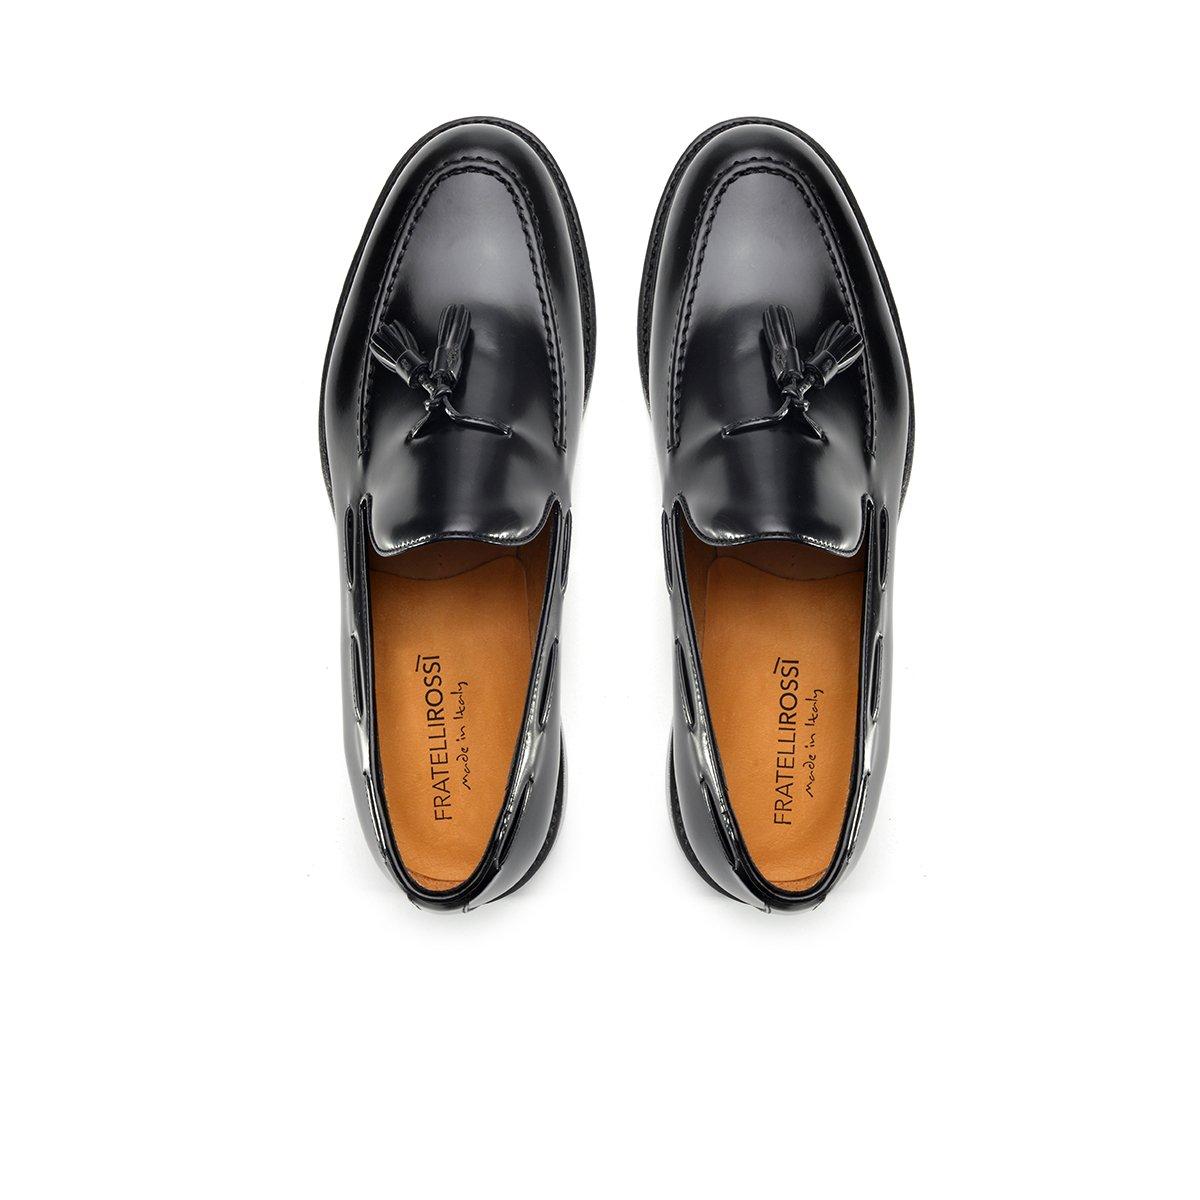 mocassini goodyear eleganti in pelle abrasivata nera